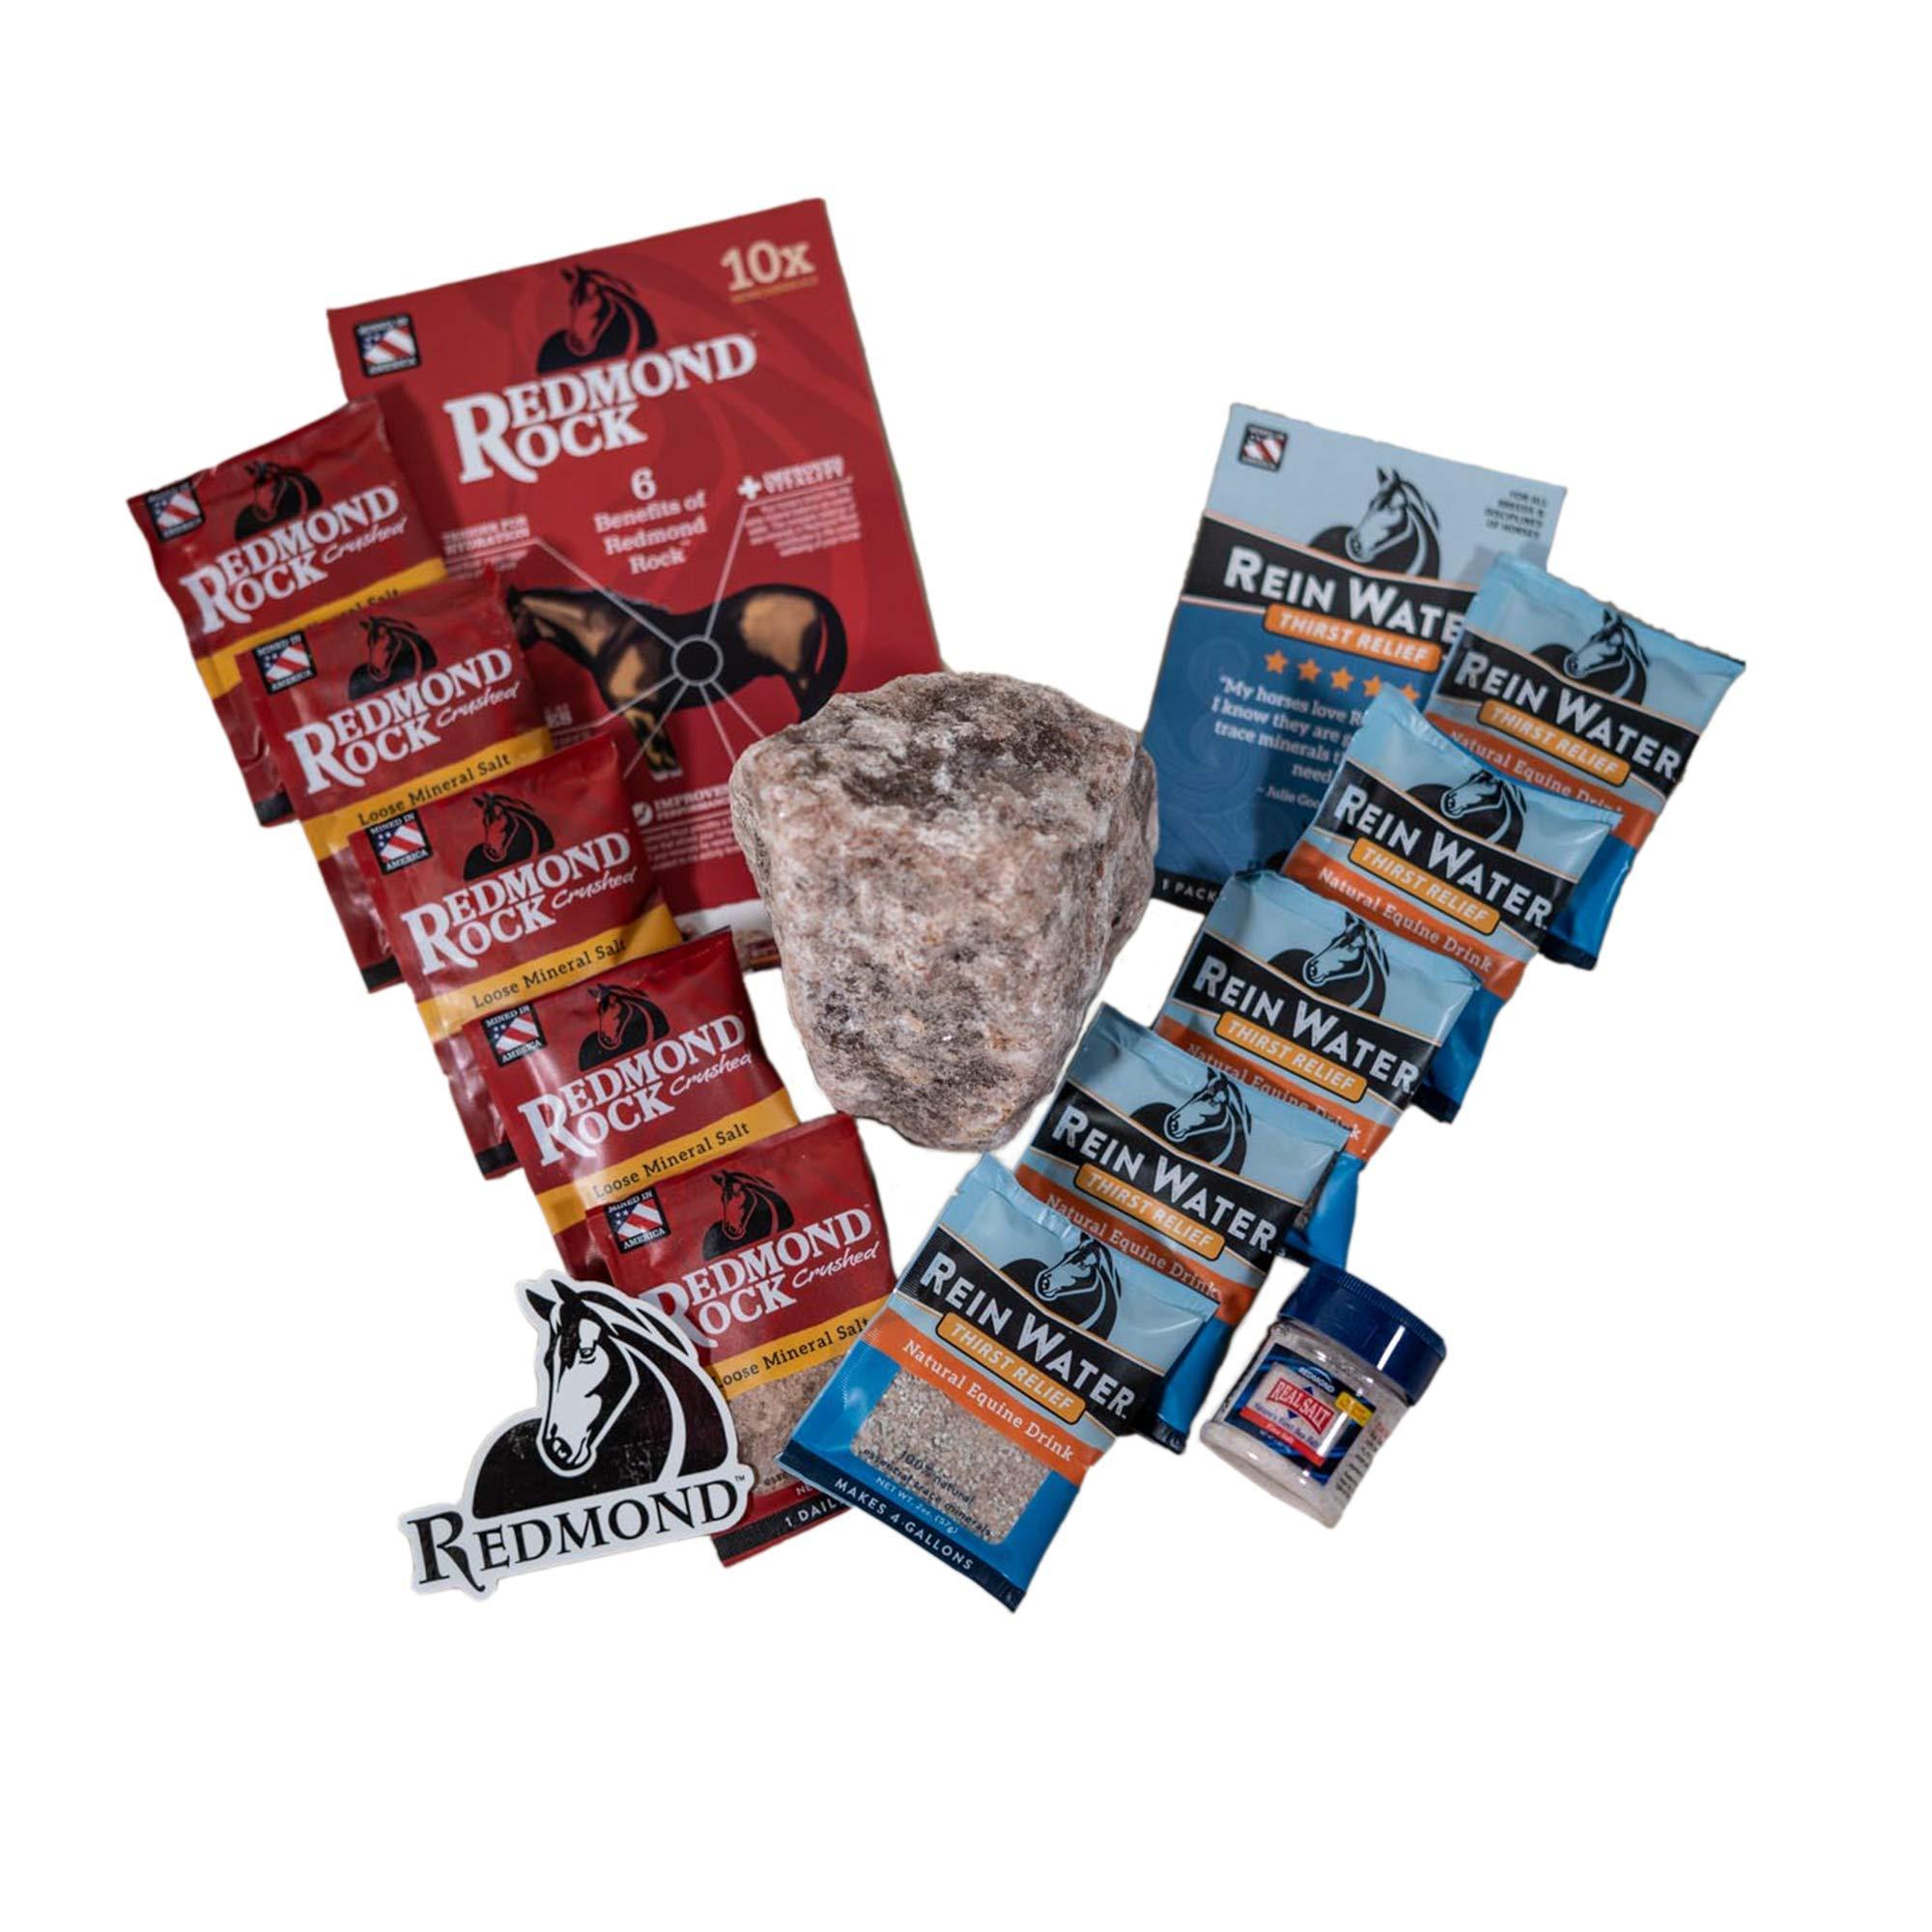 REDMOND Rock Crushed Loose Mineral Salt Electrolyte Supplement for Horses (Sample Pack) by REDMOND